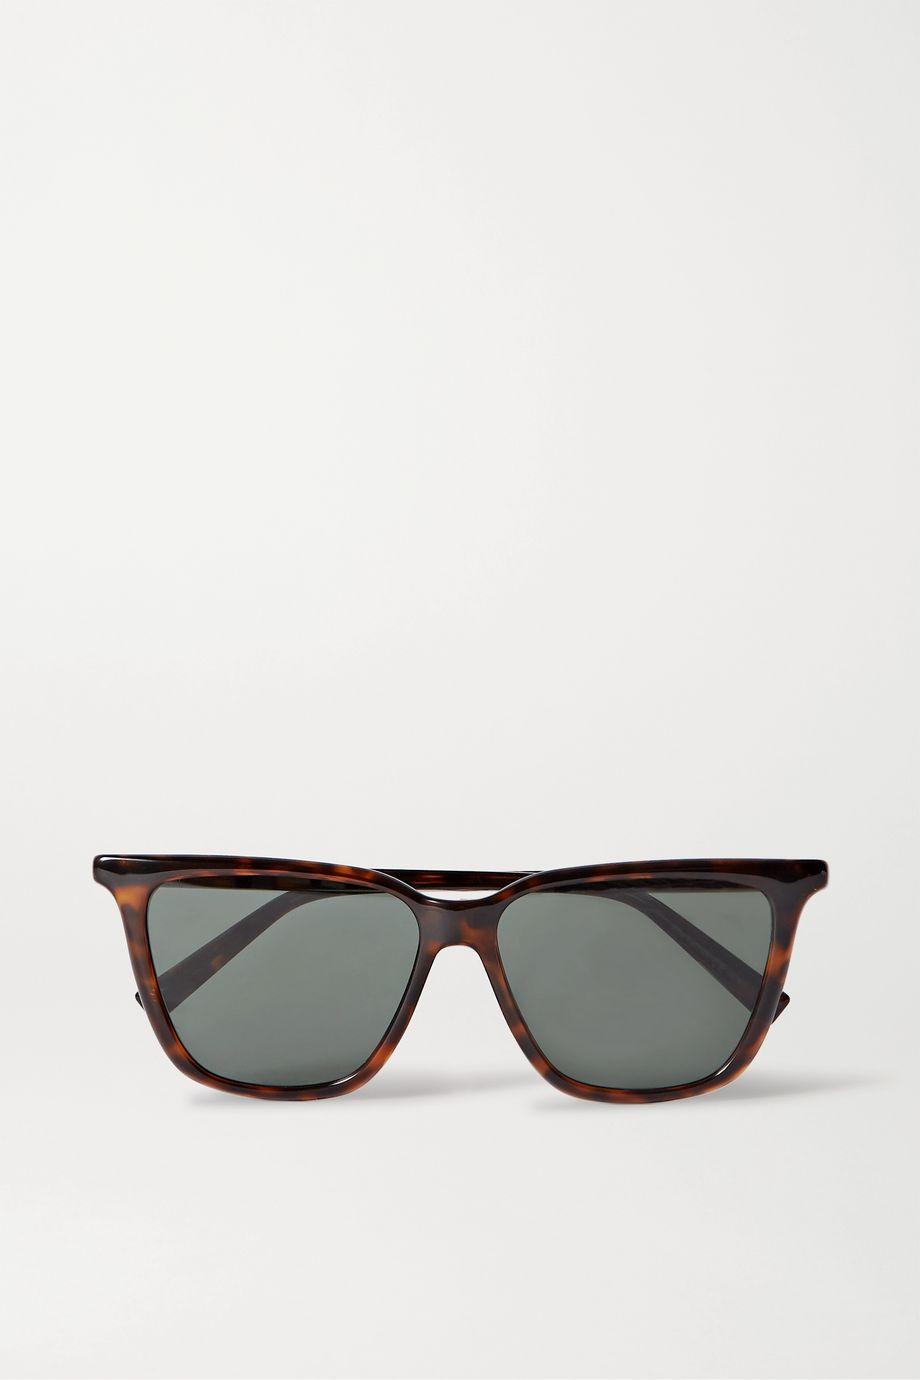 Givenchy Sonnenbrille mit eckigem Rahmen aus Azetat in Hornoptik